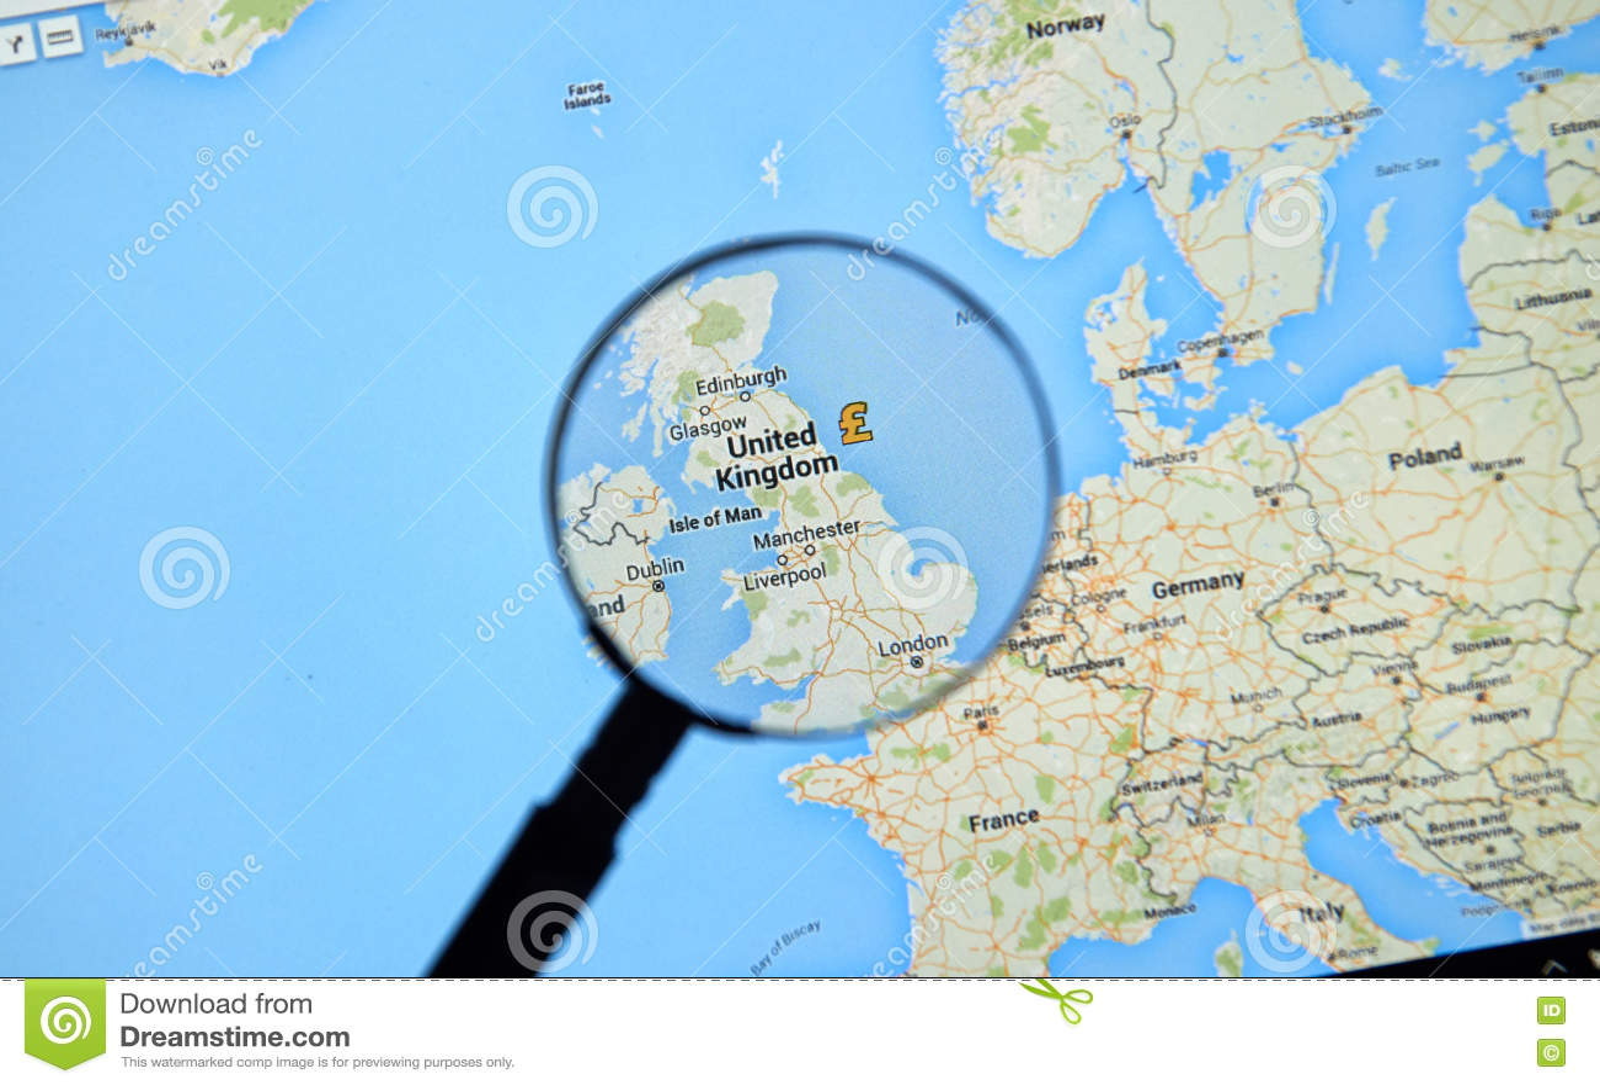 Google Maps Montreal on